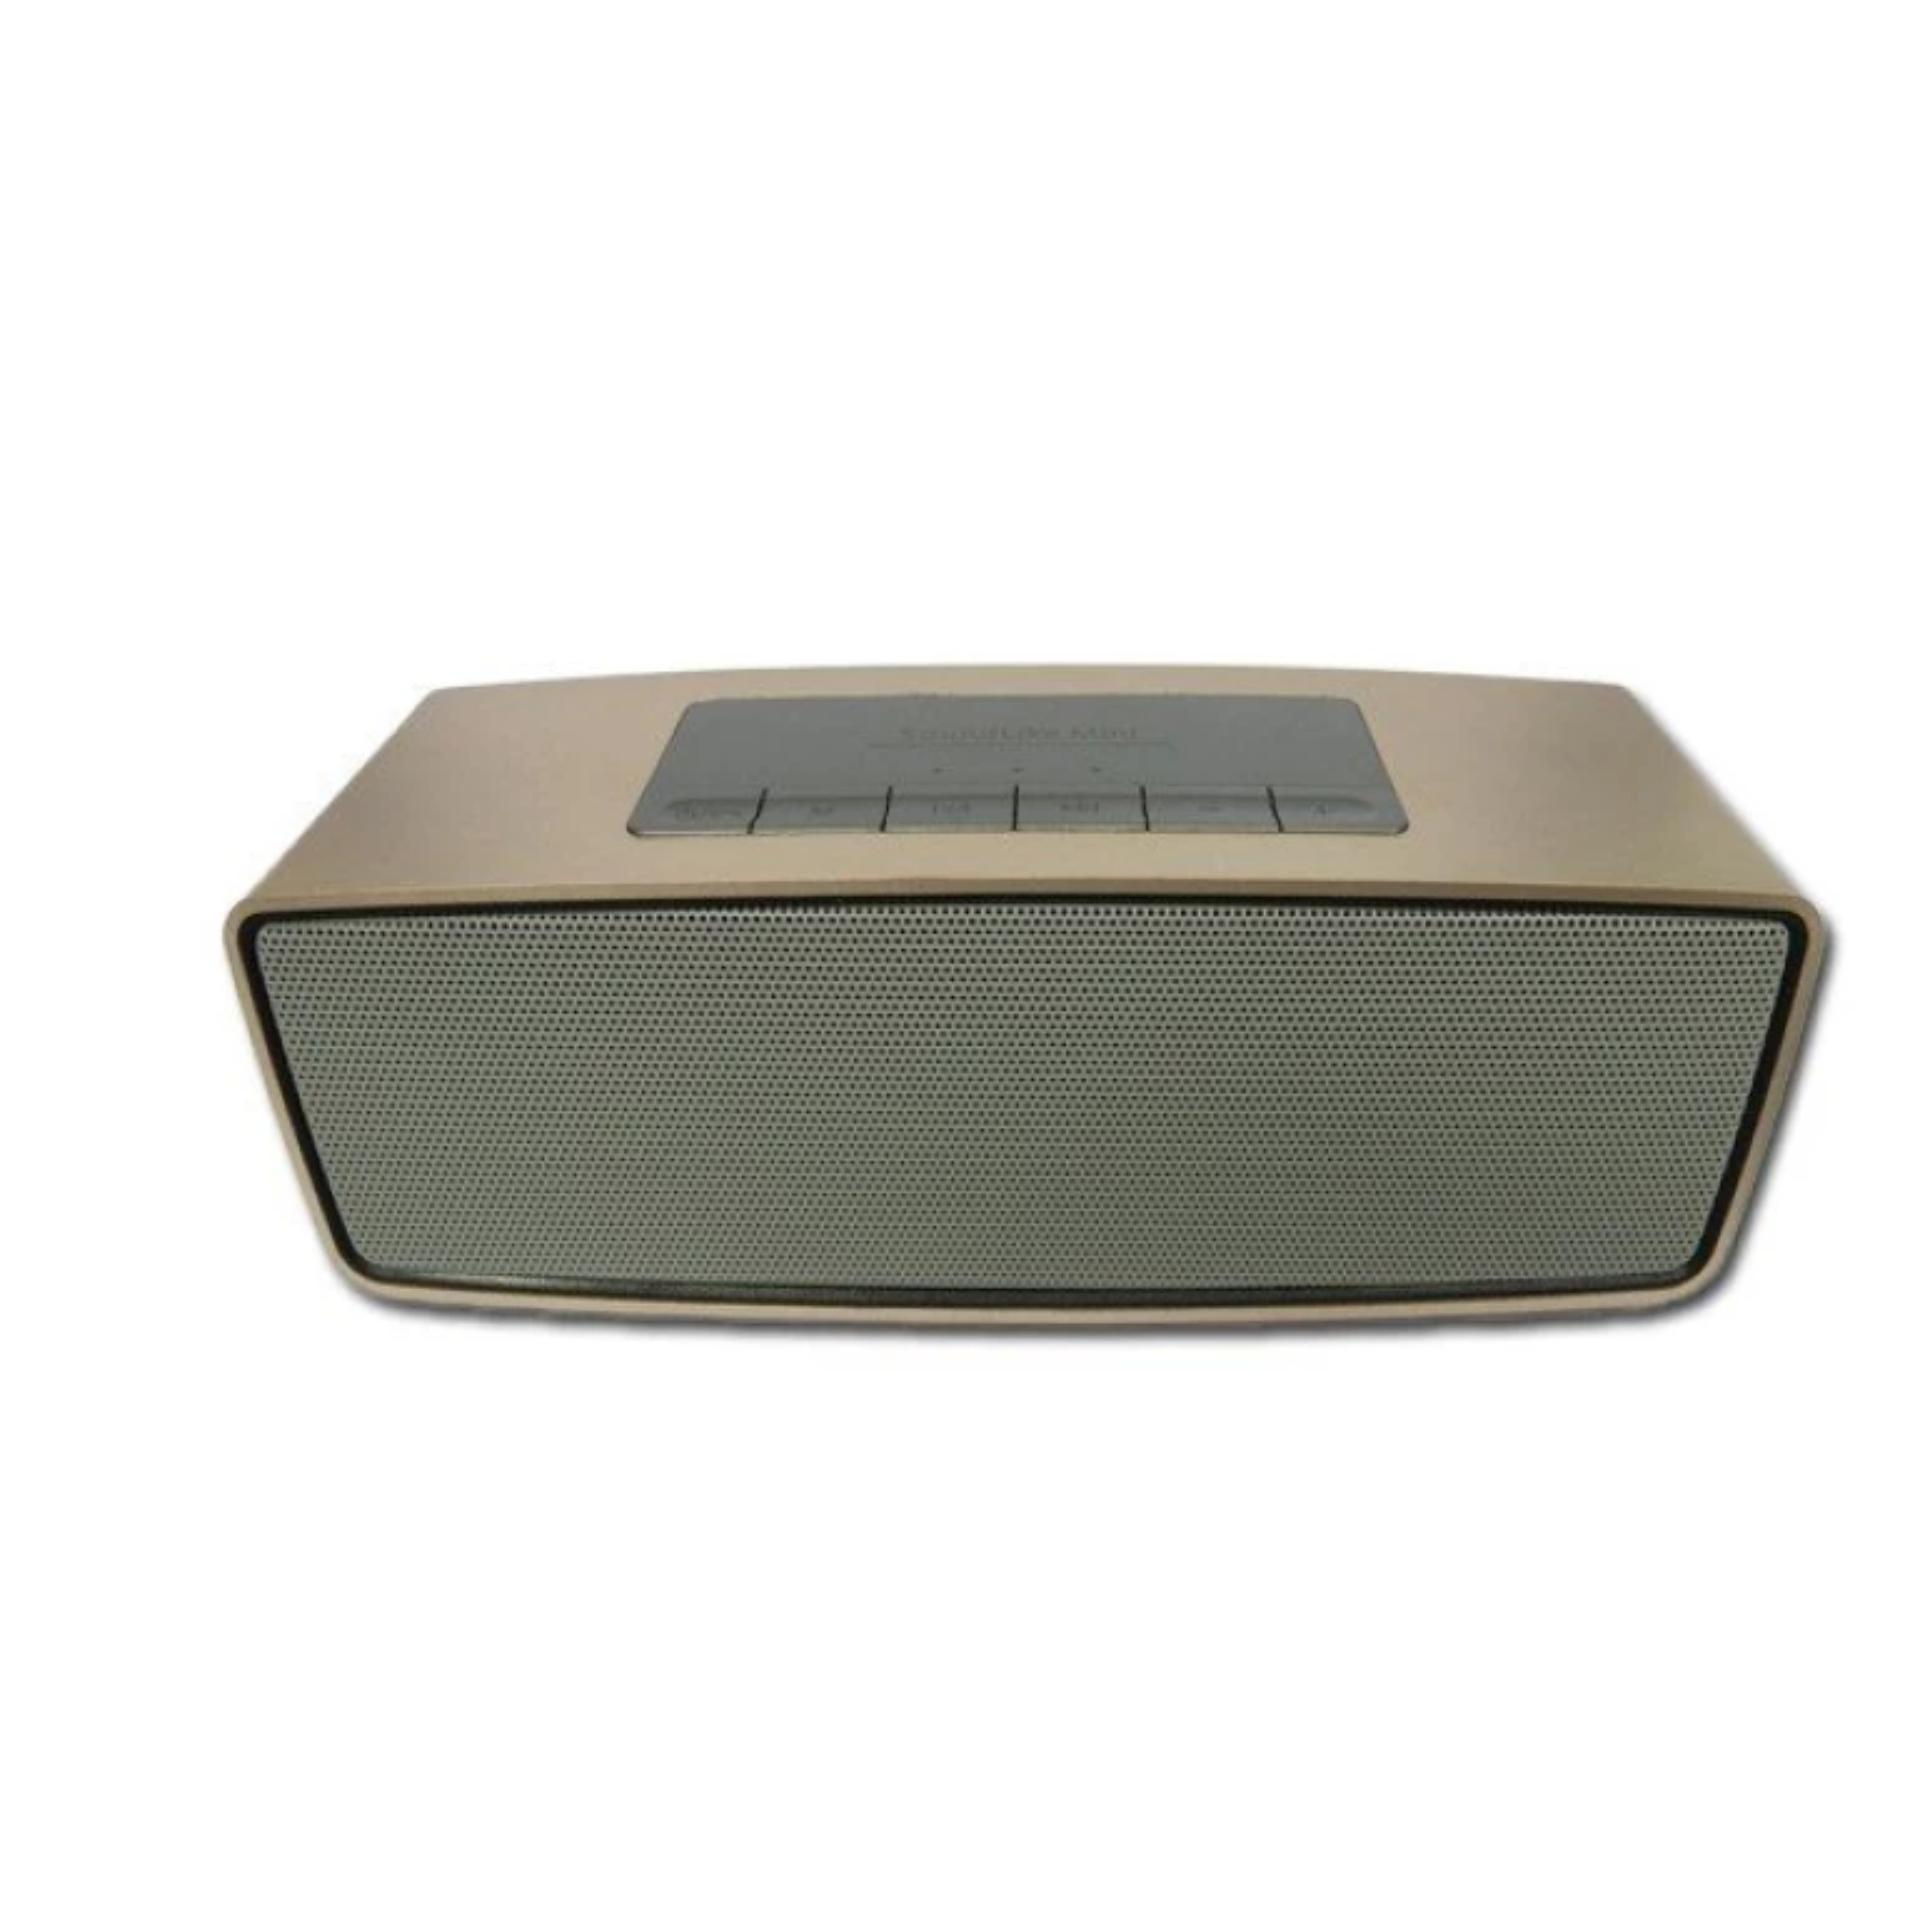 Loa bluetooth không dây Mini Speaker S815